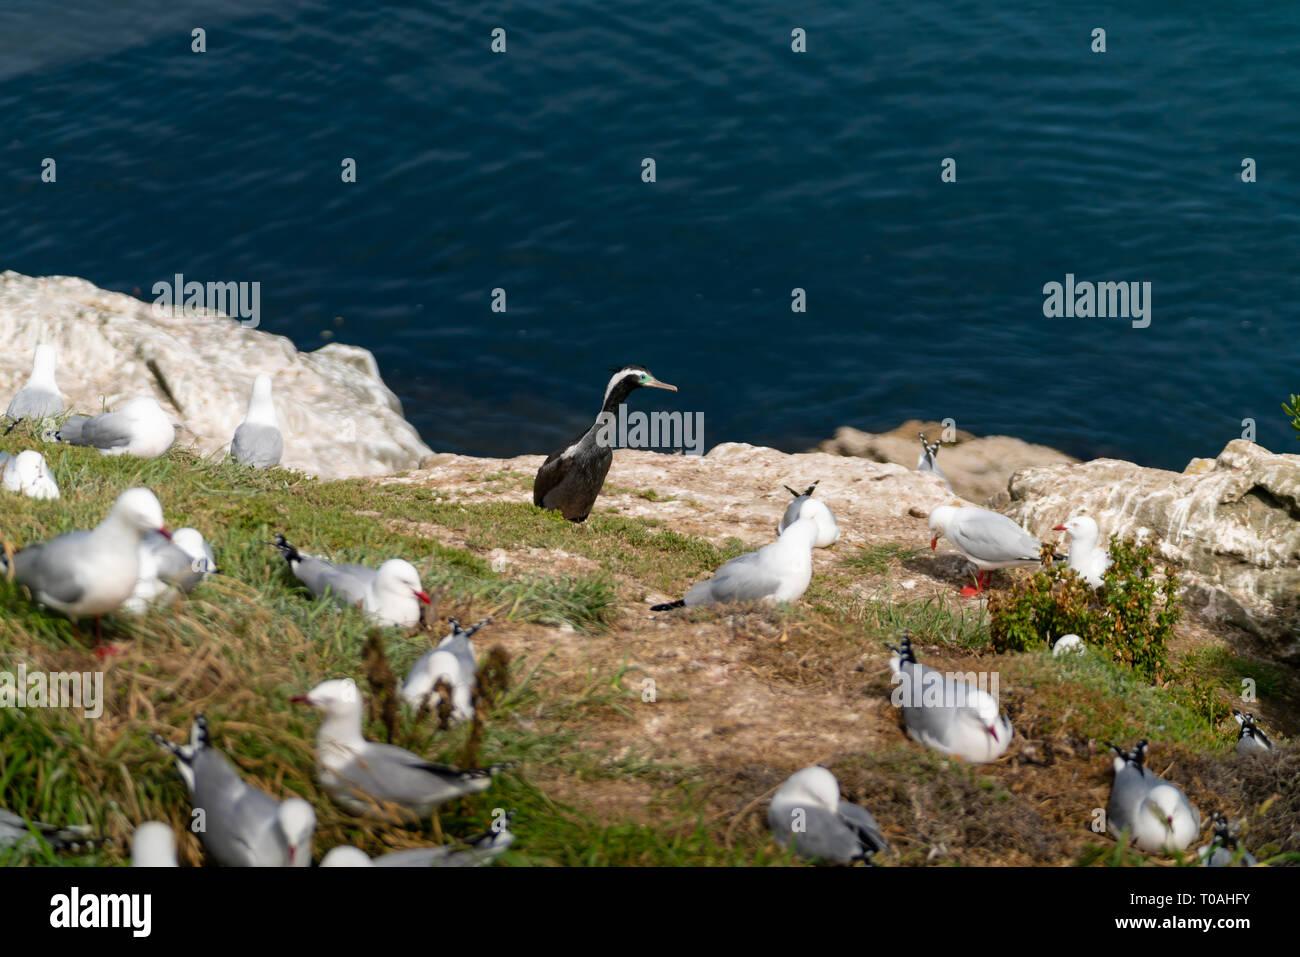 New Zealand spotted shag among breeding colony of red billed seagulls at Katiki Point, Moeraki - Stock Image